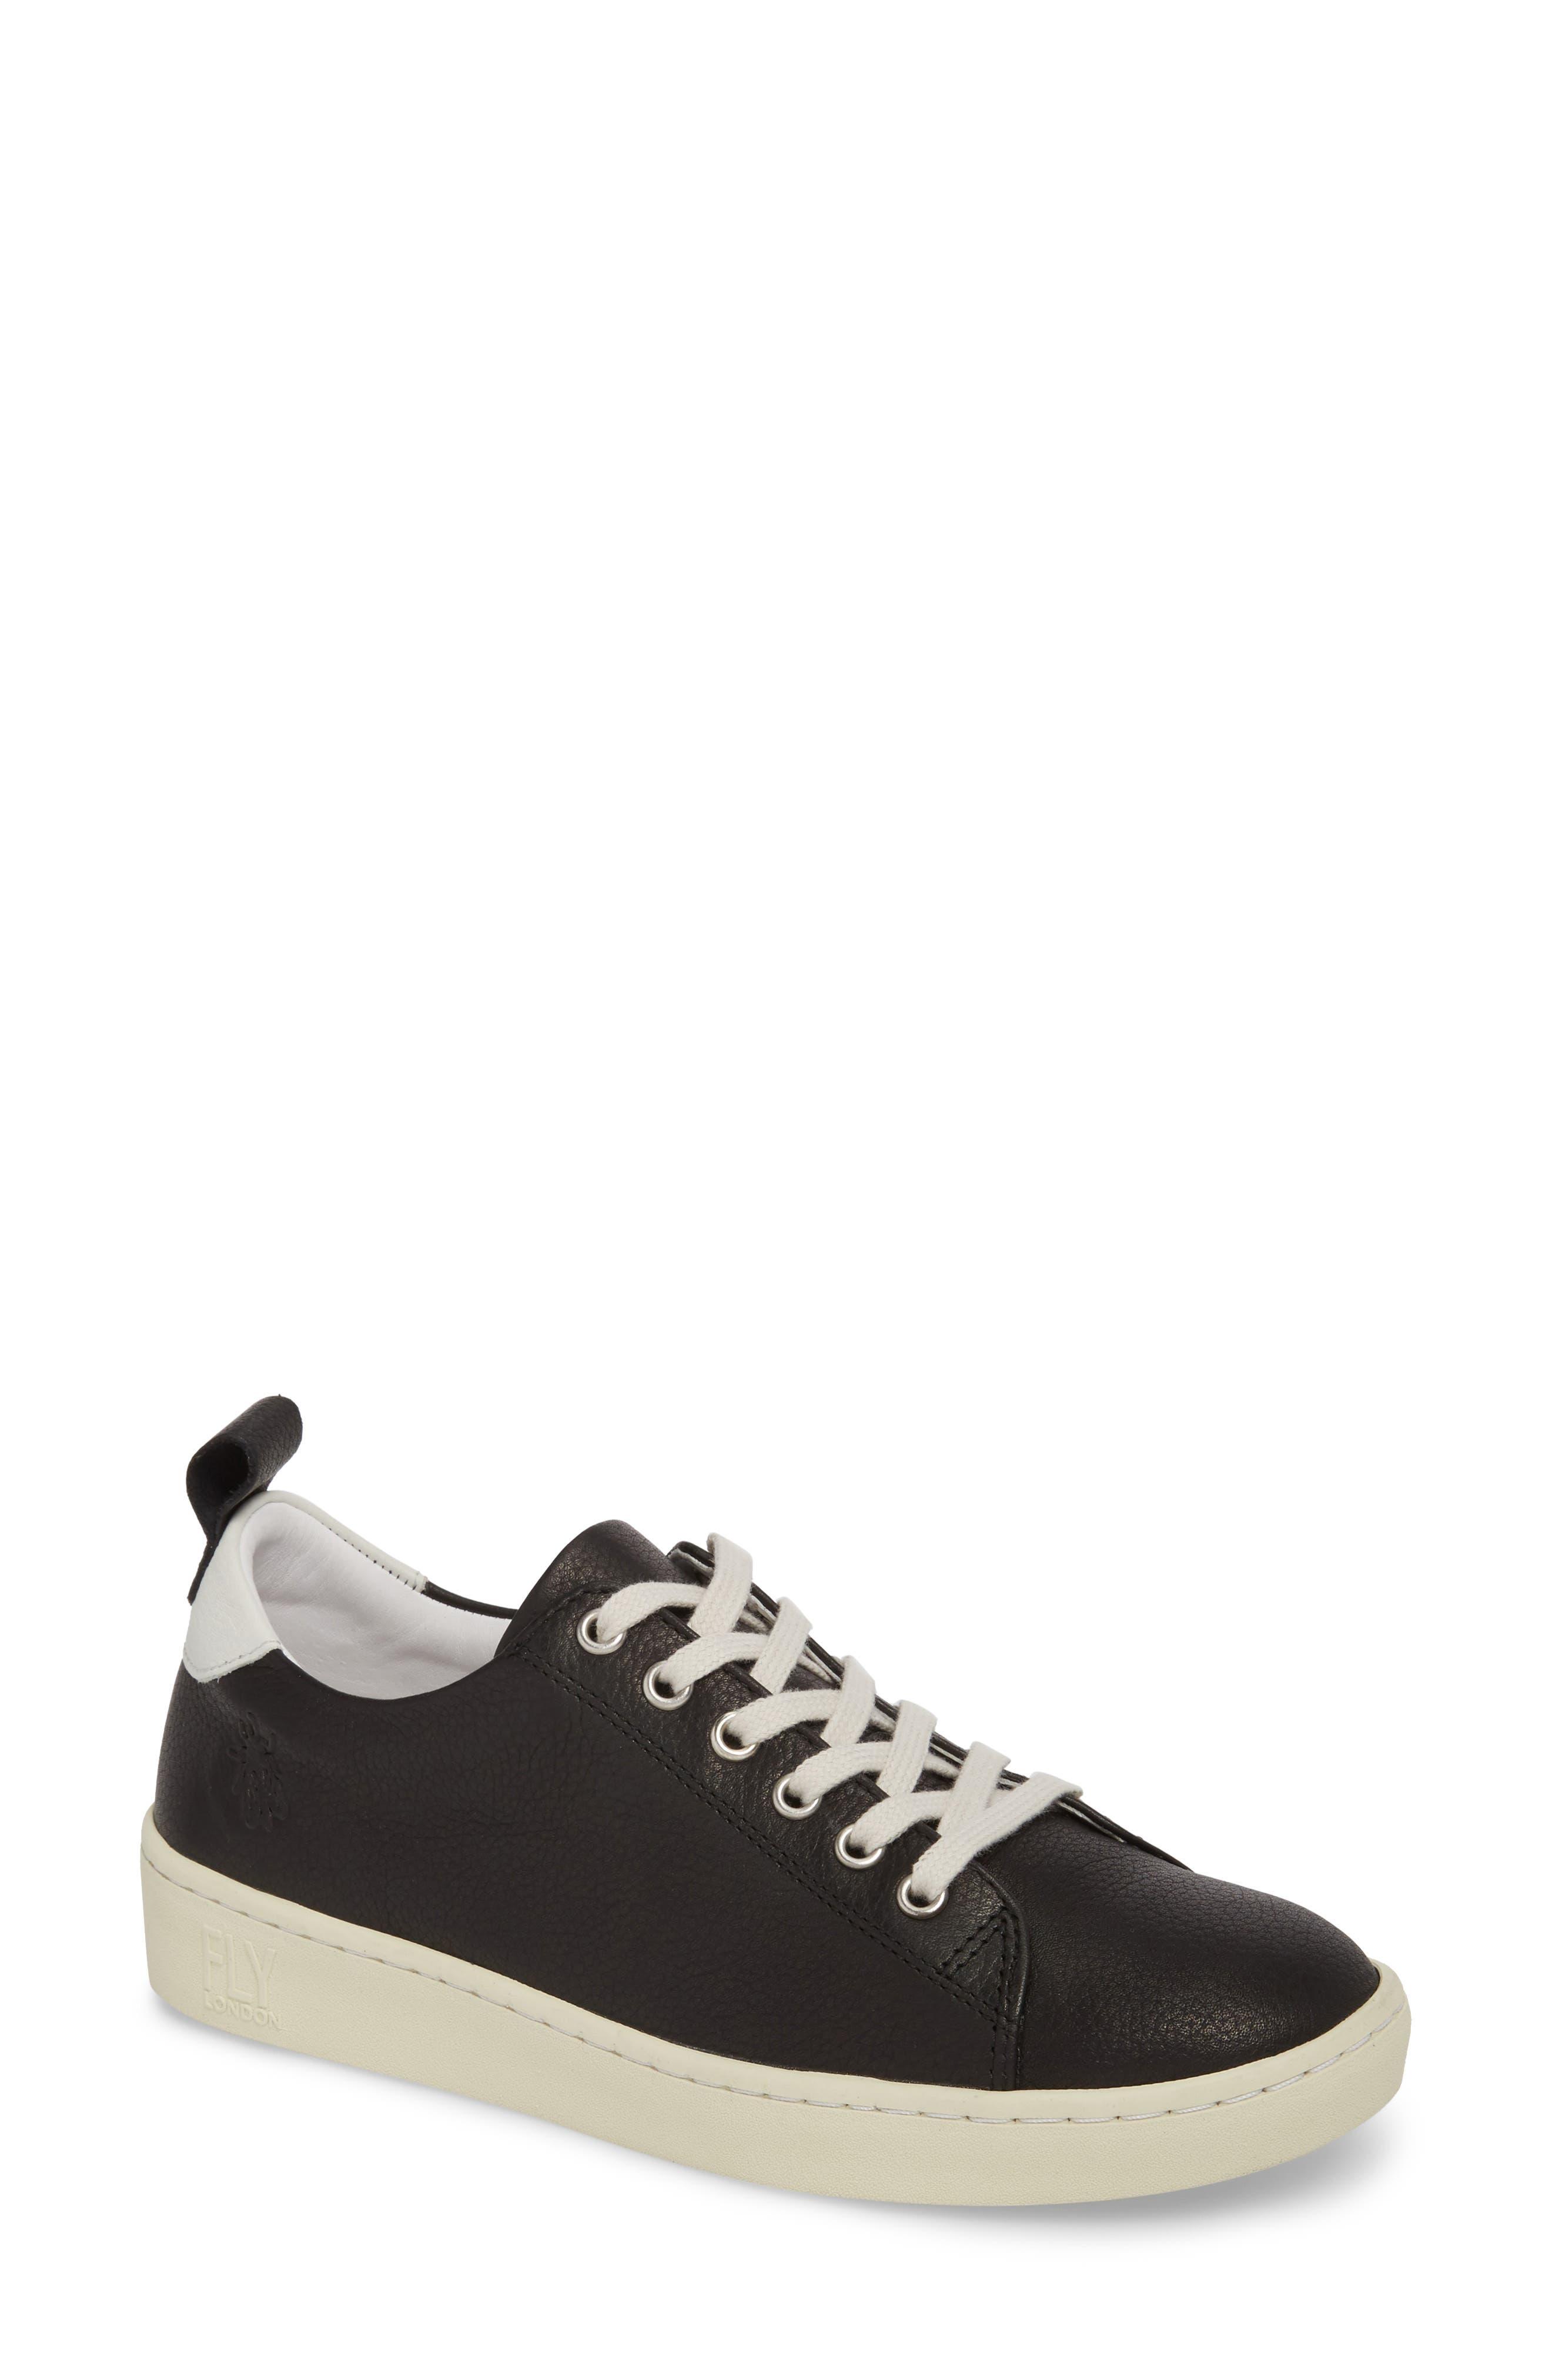 Maku Lace-Up Sneaker,                         Main,                         color, BLACK BRITO LEATHER